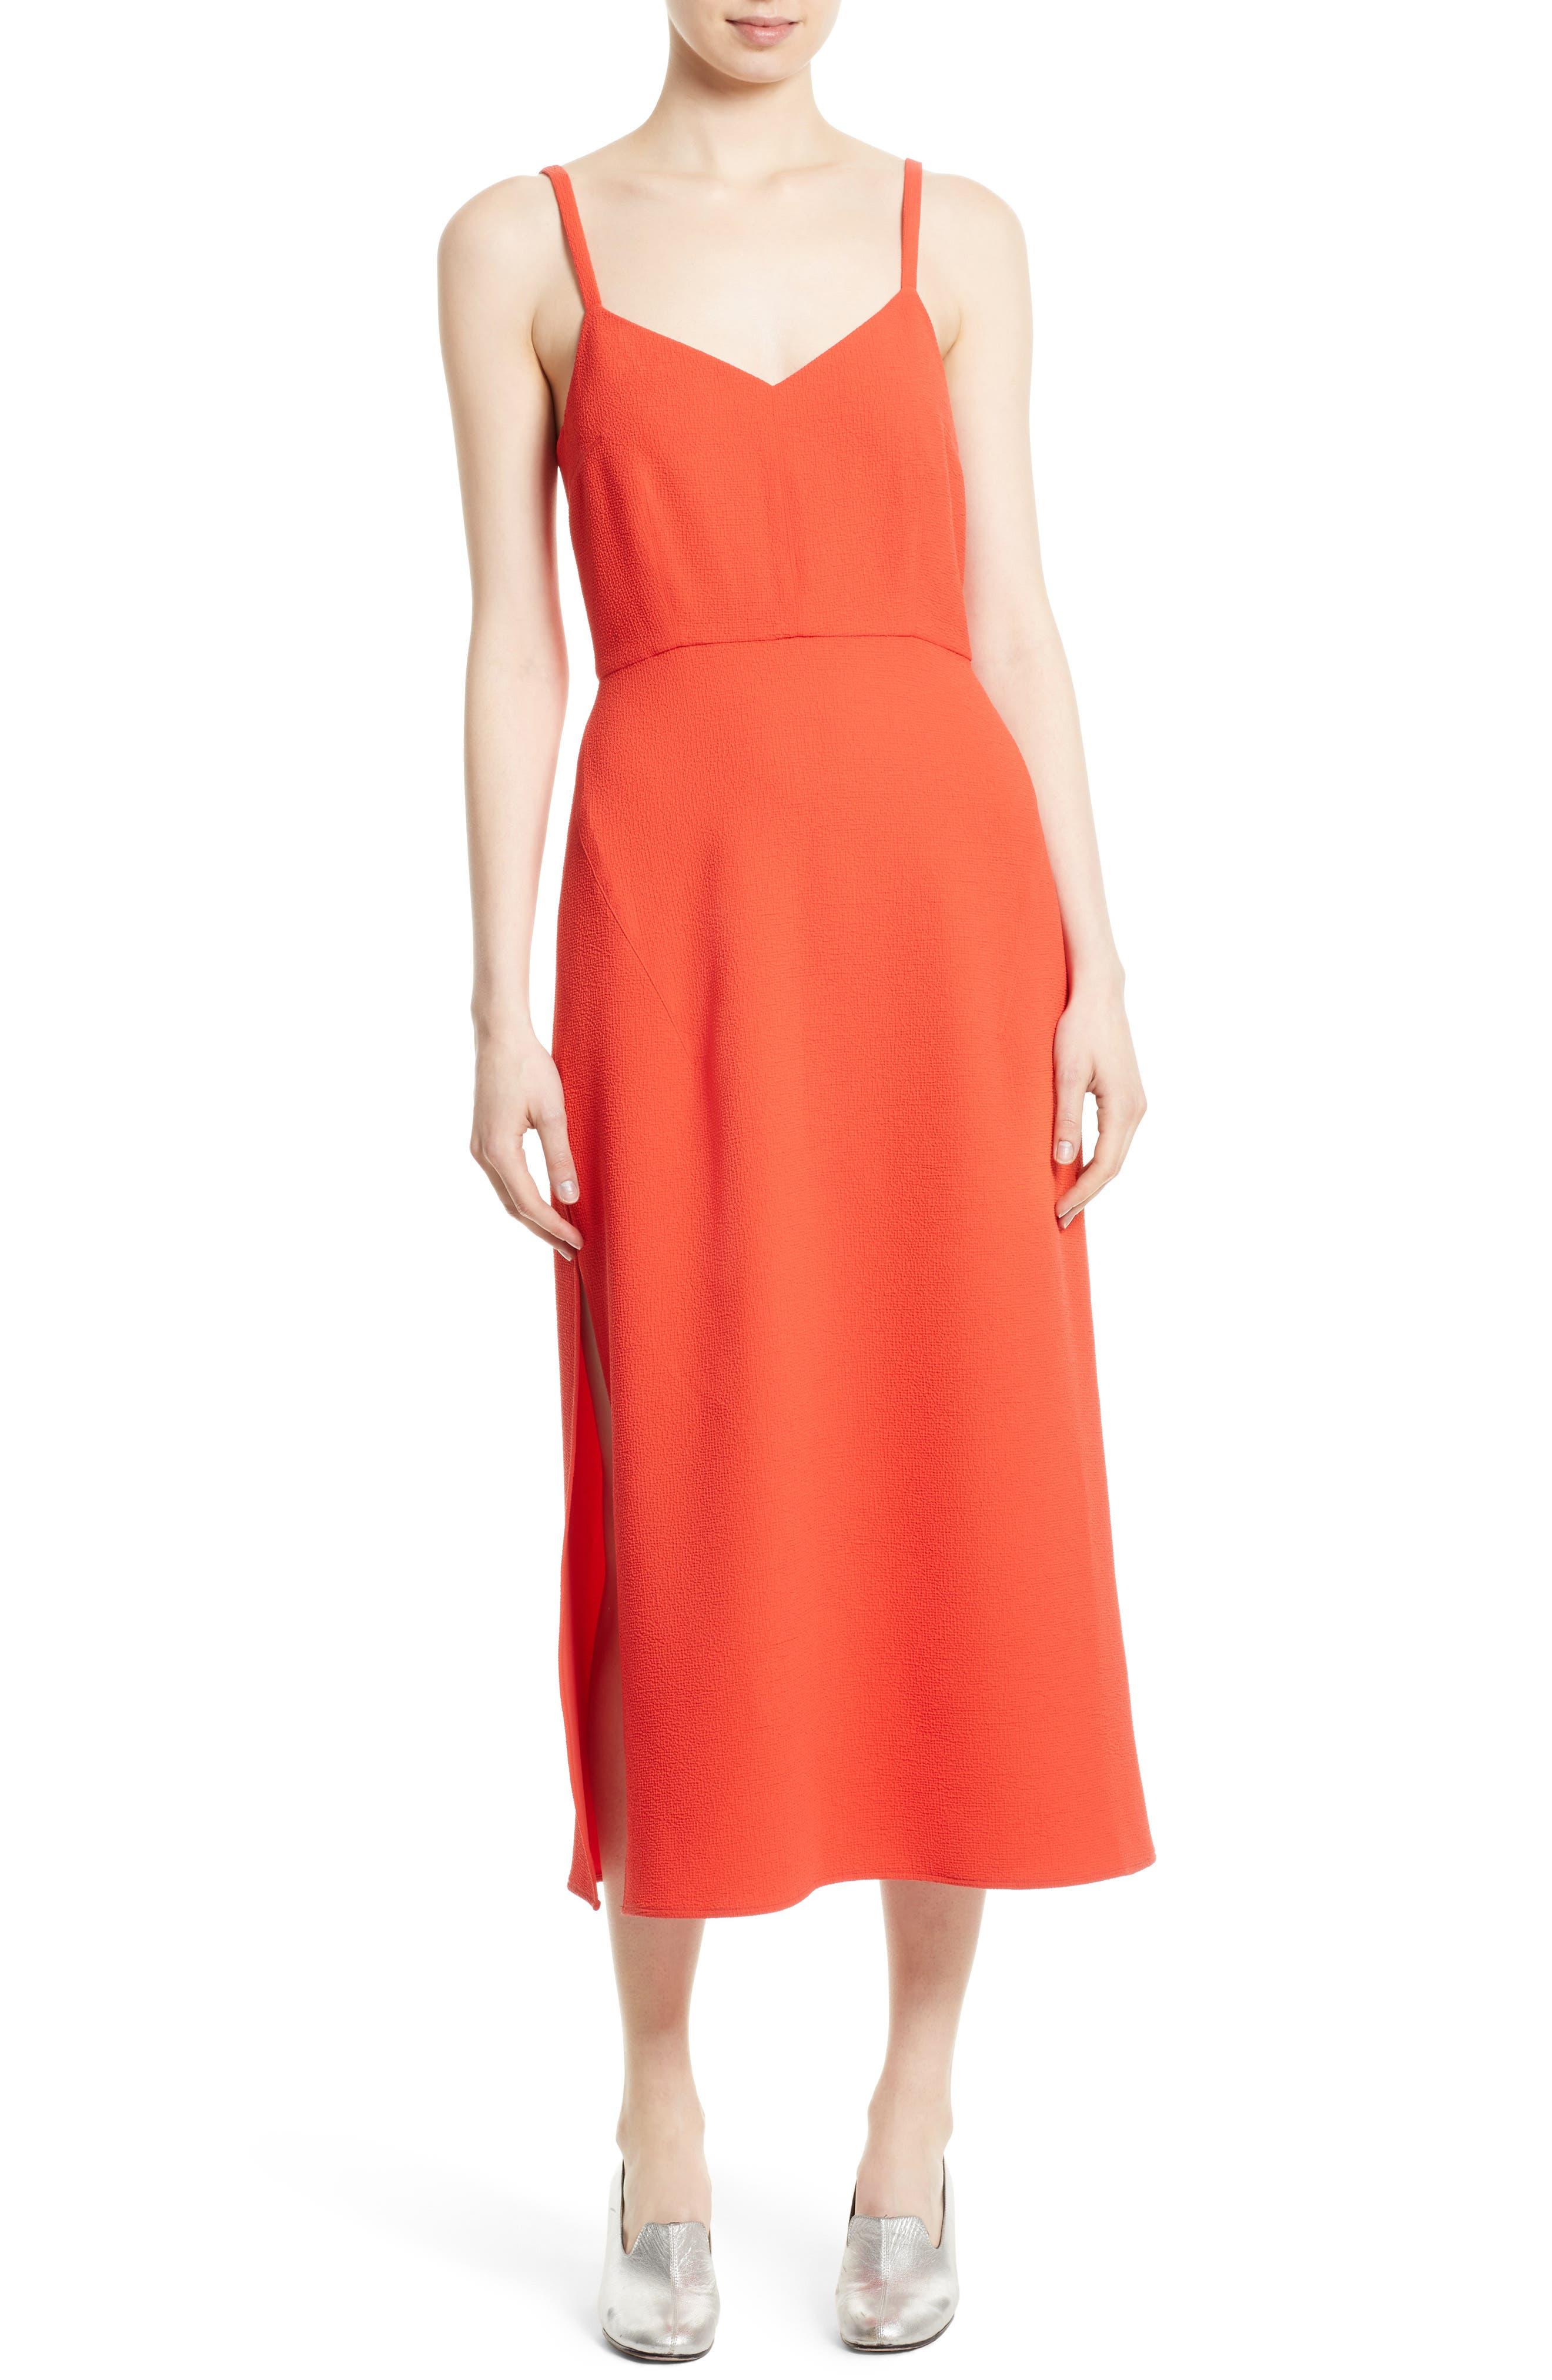 Rachel Comey Agitator Midi Dress